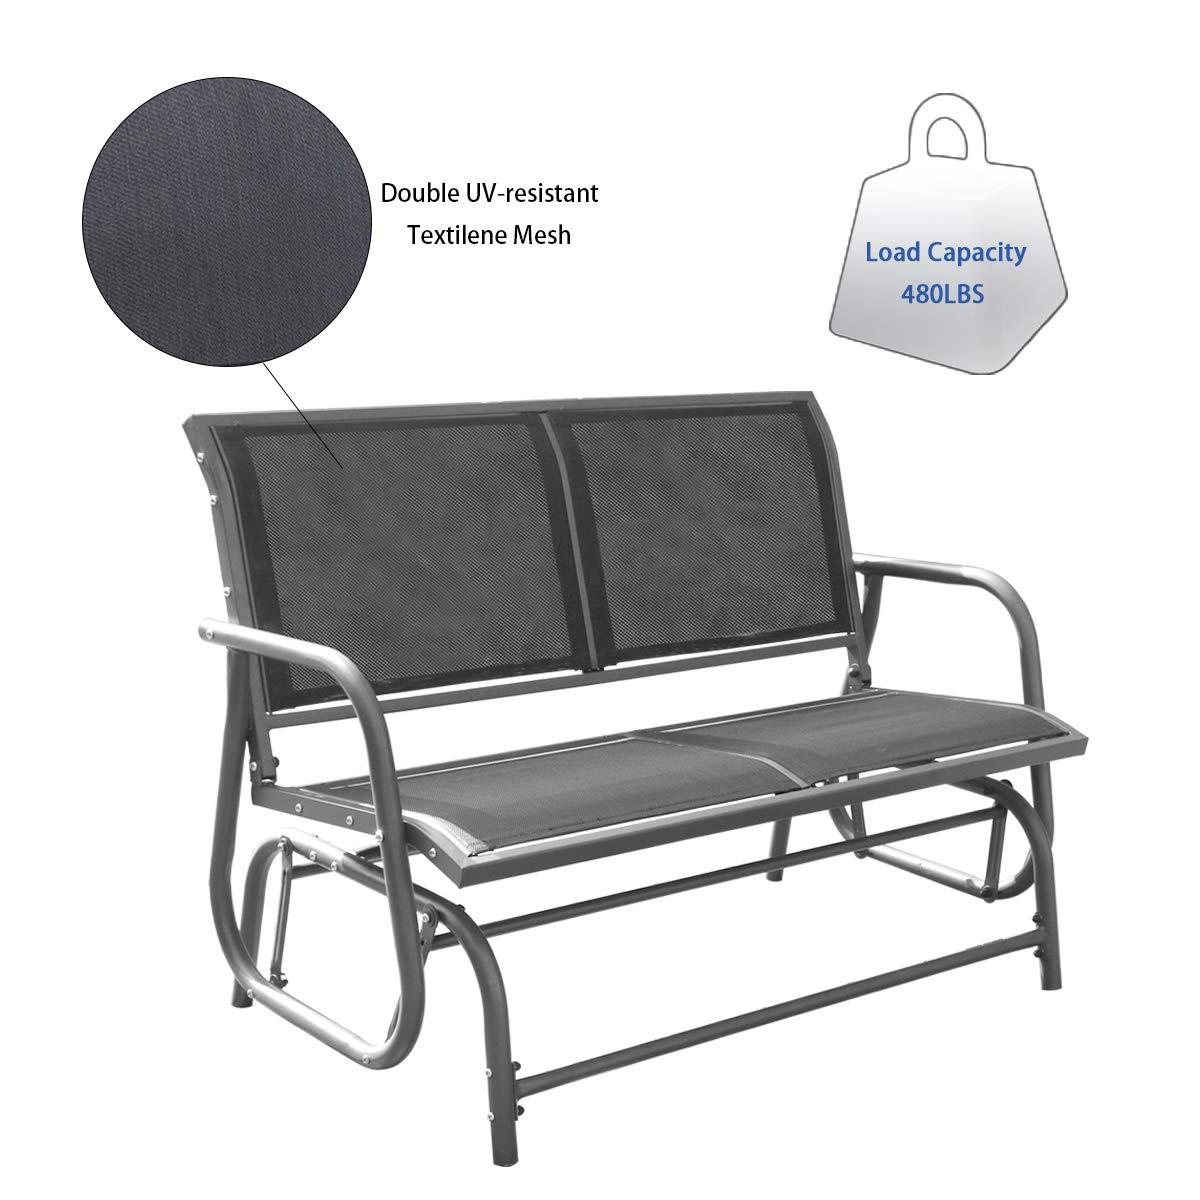 Yardeen Porch Swing Glider Chair Loveseat Rocking Bench Garden Seating, Double Grey Mesh